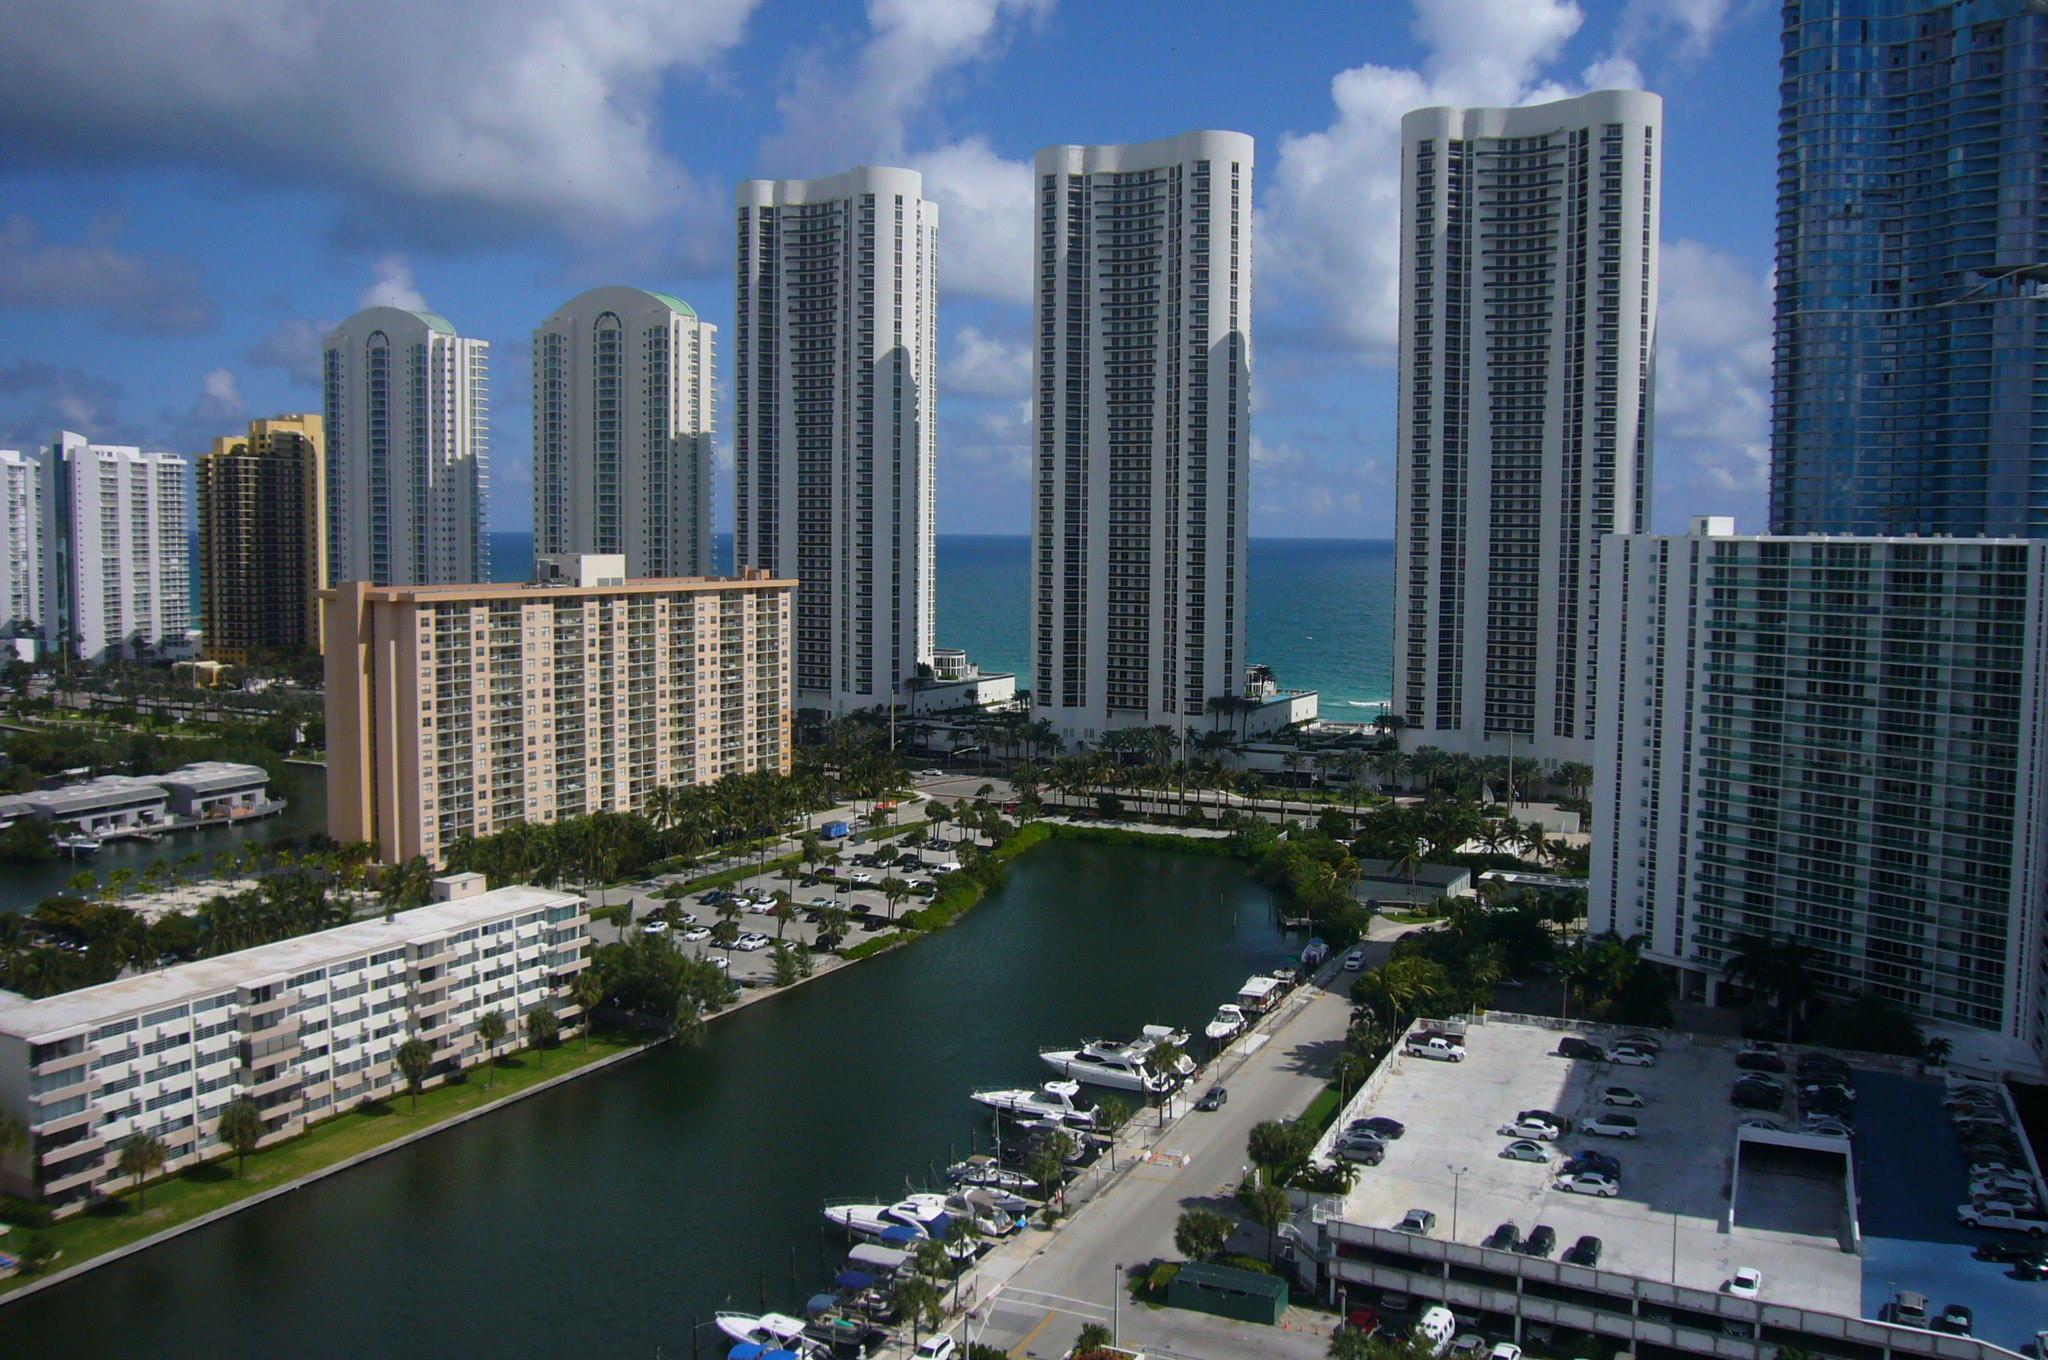 300 Bayview Drive Ph09 Sunny Isles Beach, FL 33160 Sunny Isles Beach FL 33160